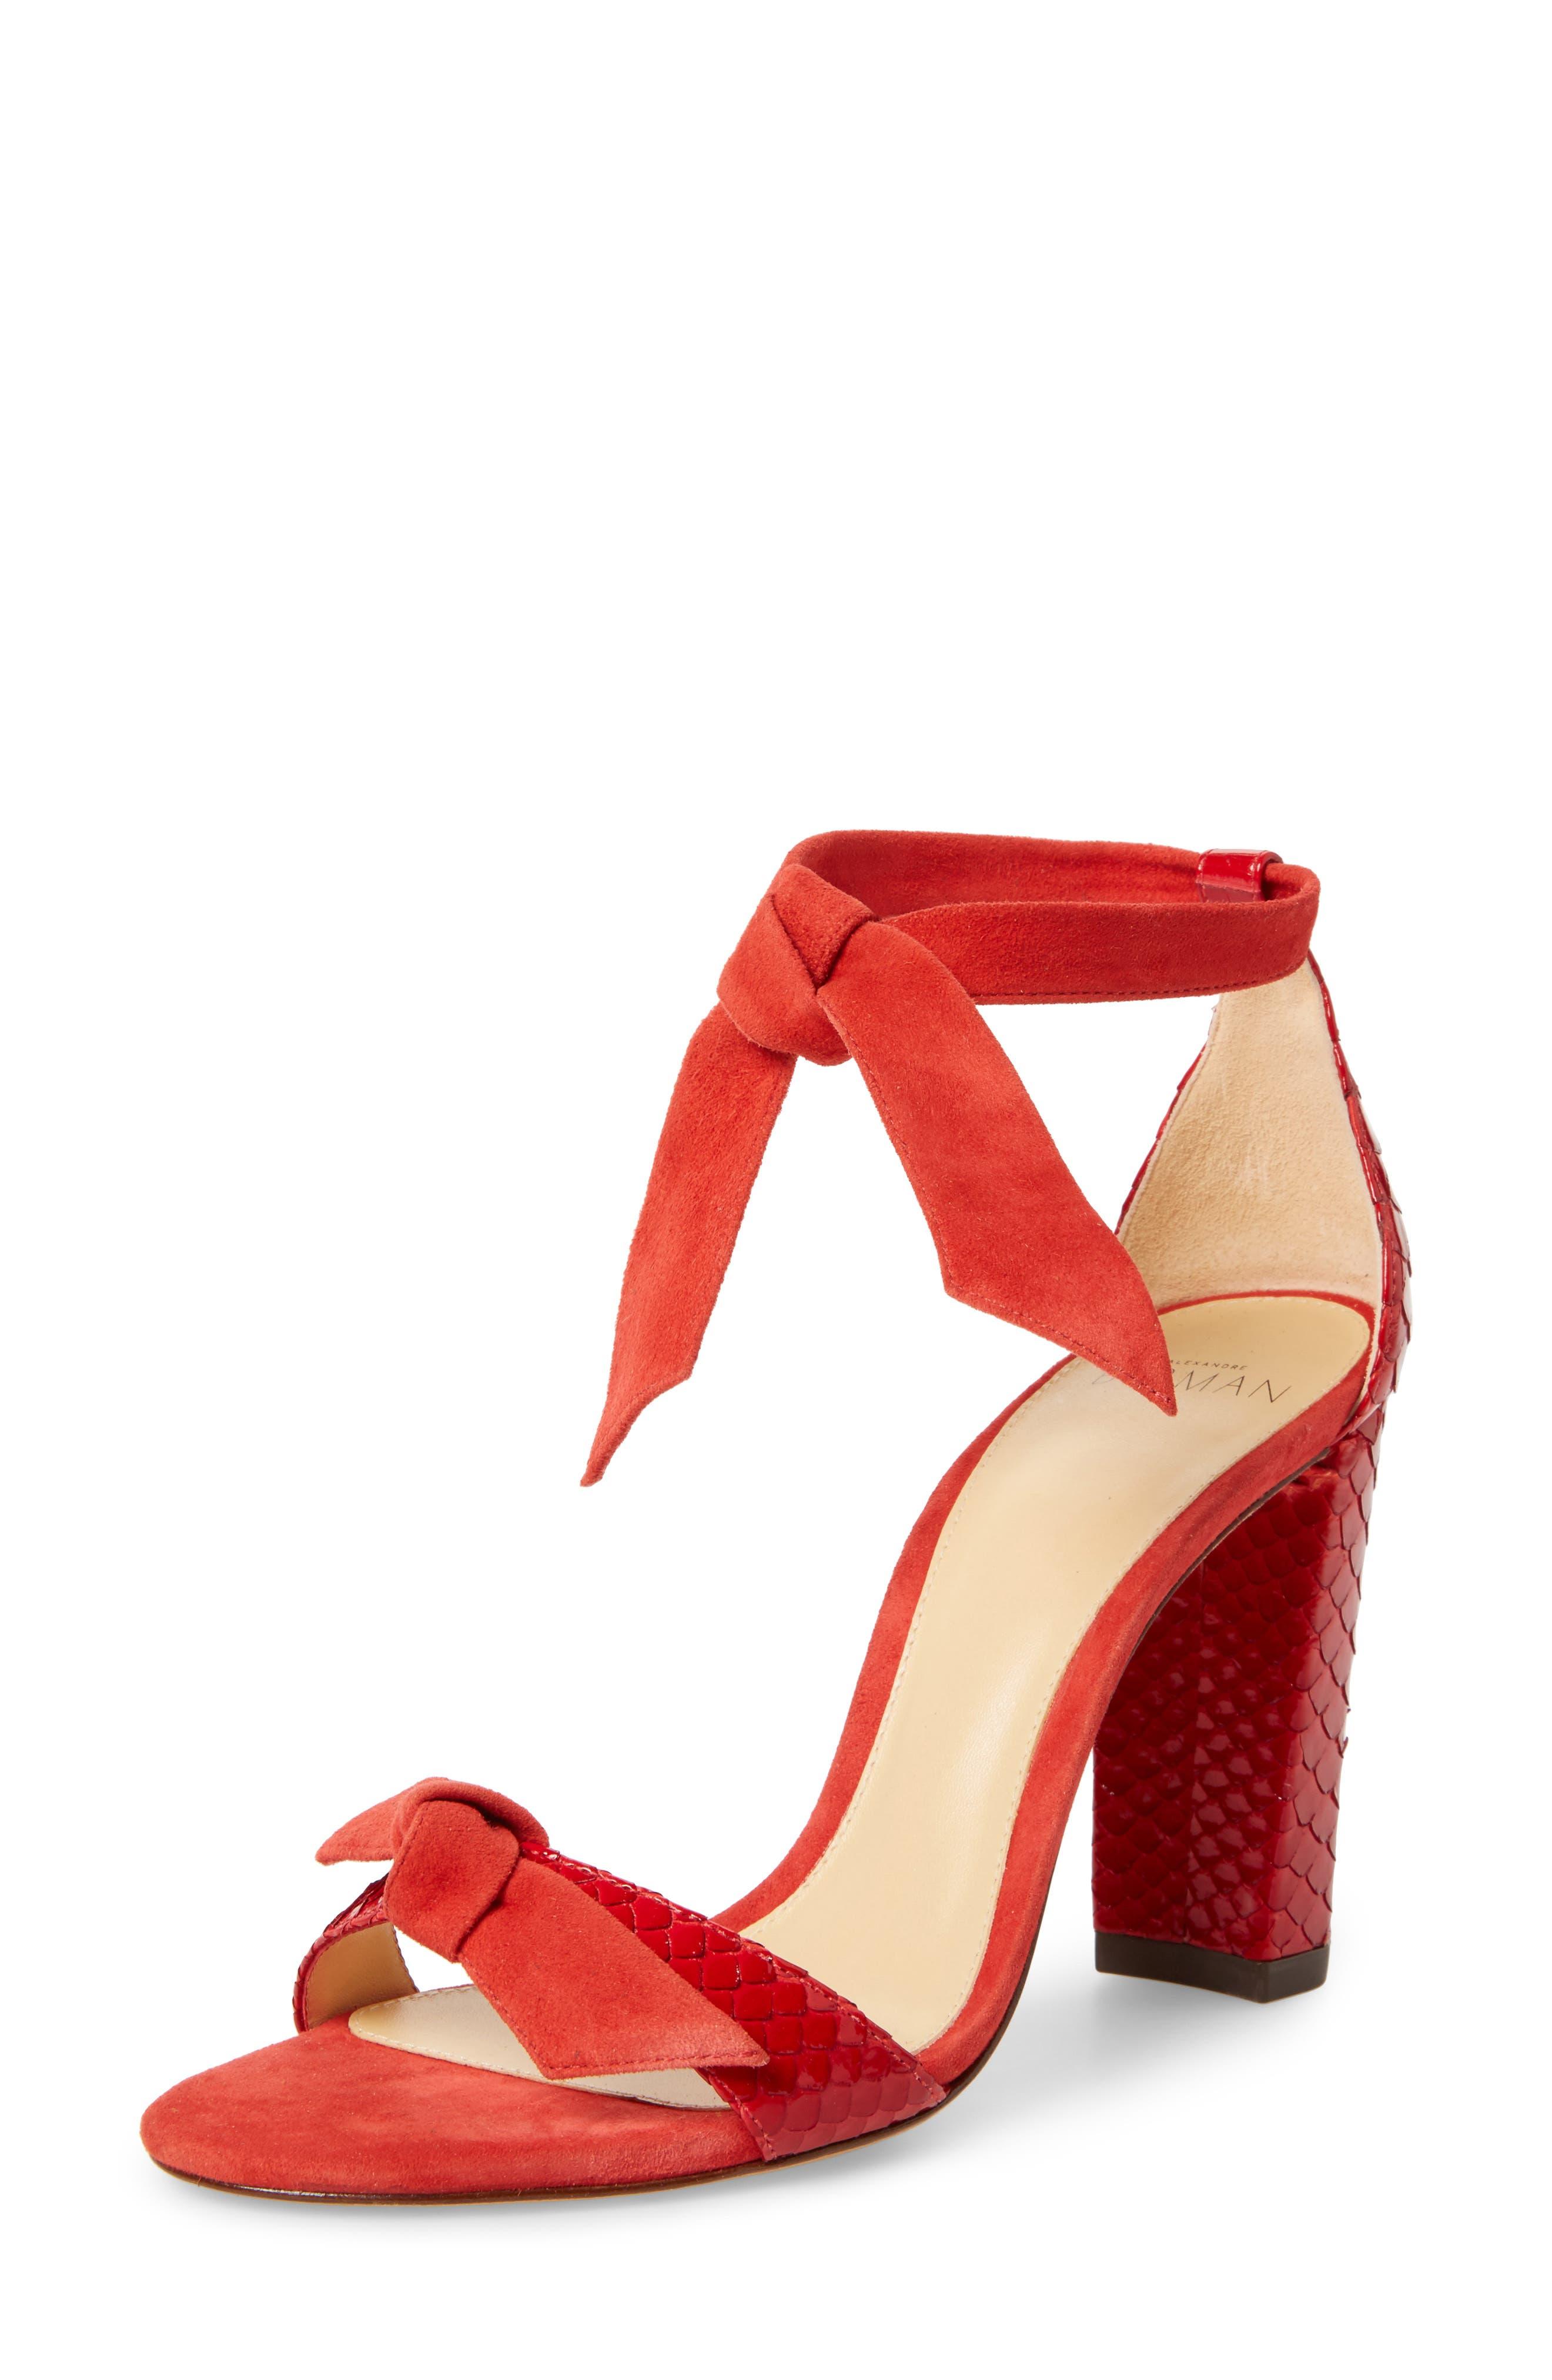 Clarita Genuine Python Ankle Tie Sandal,                         Main,                         color, 600